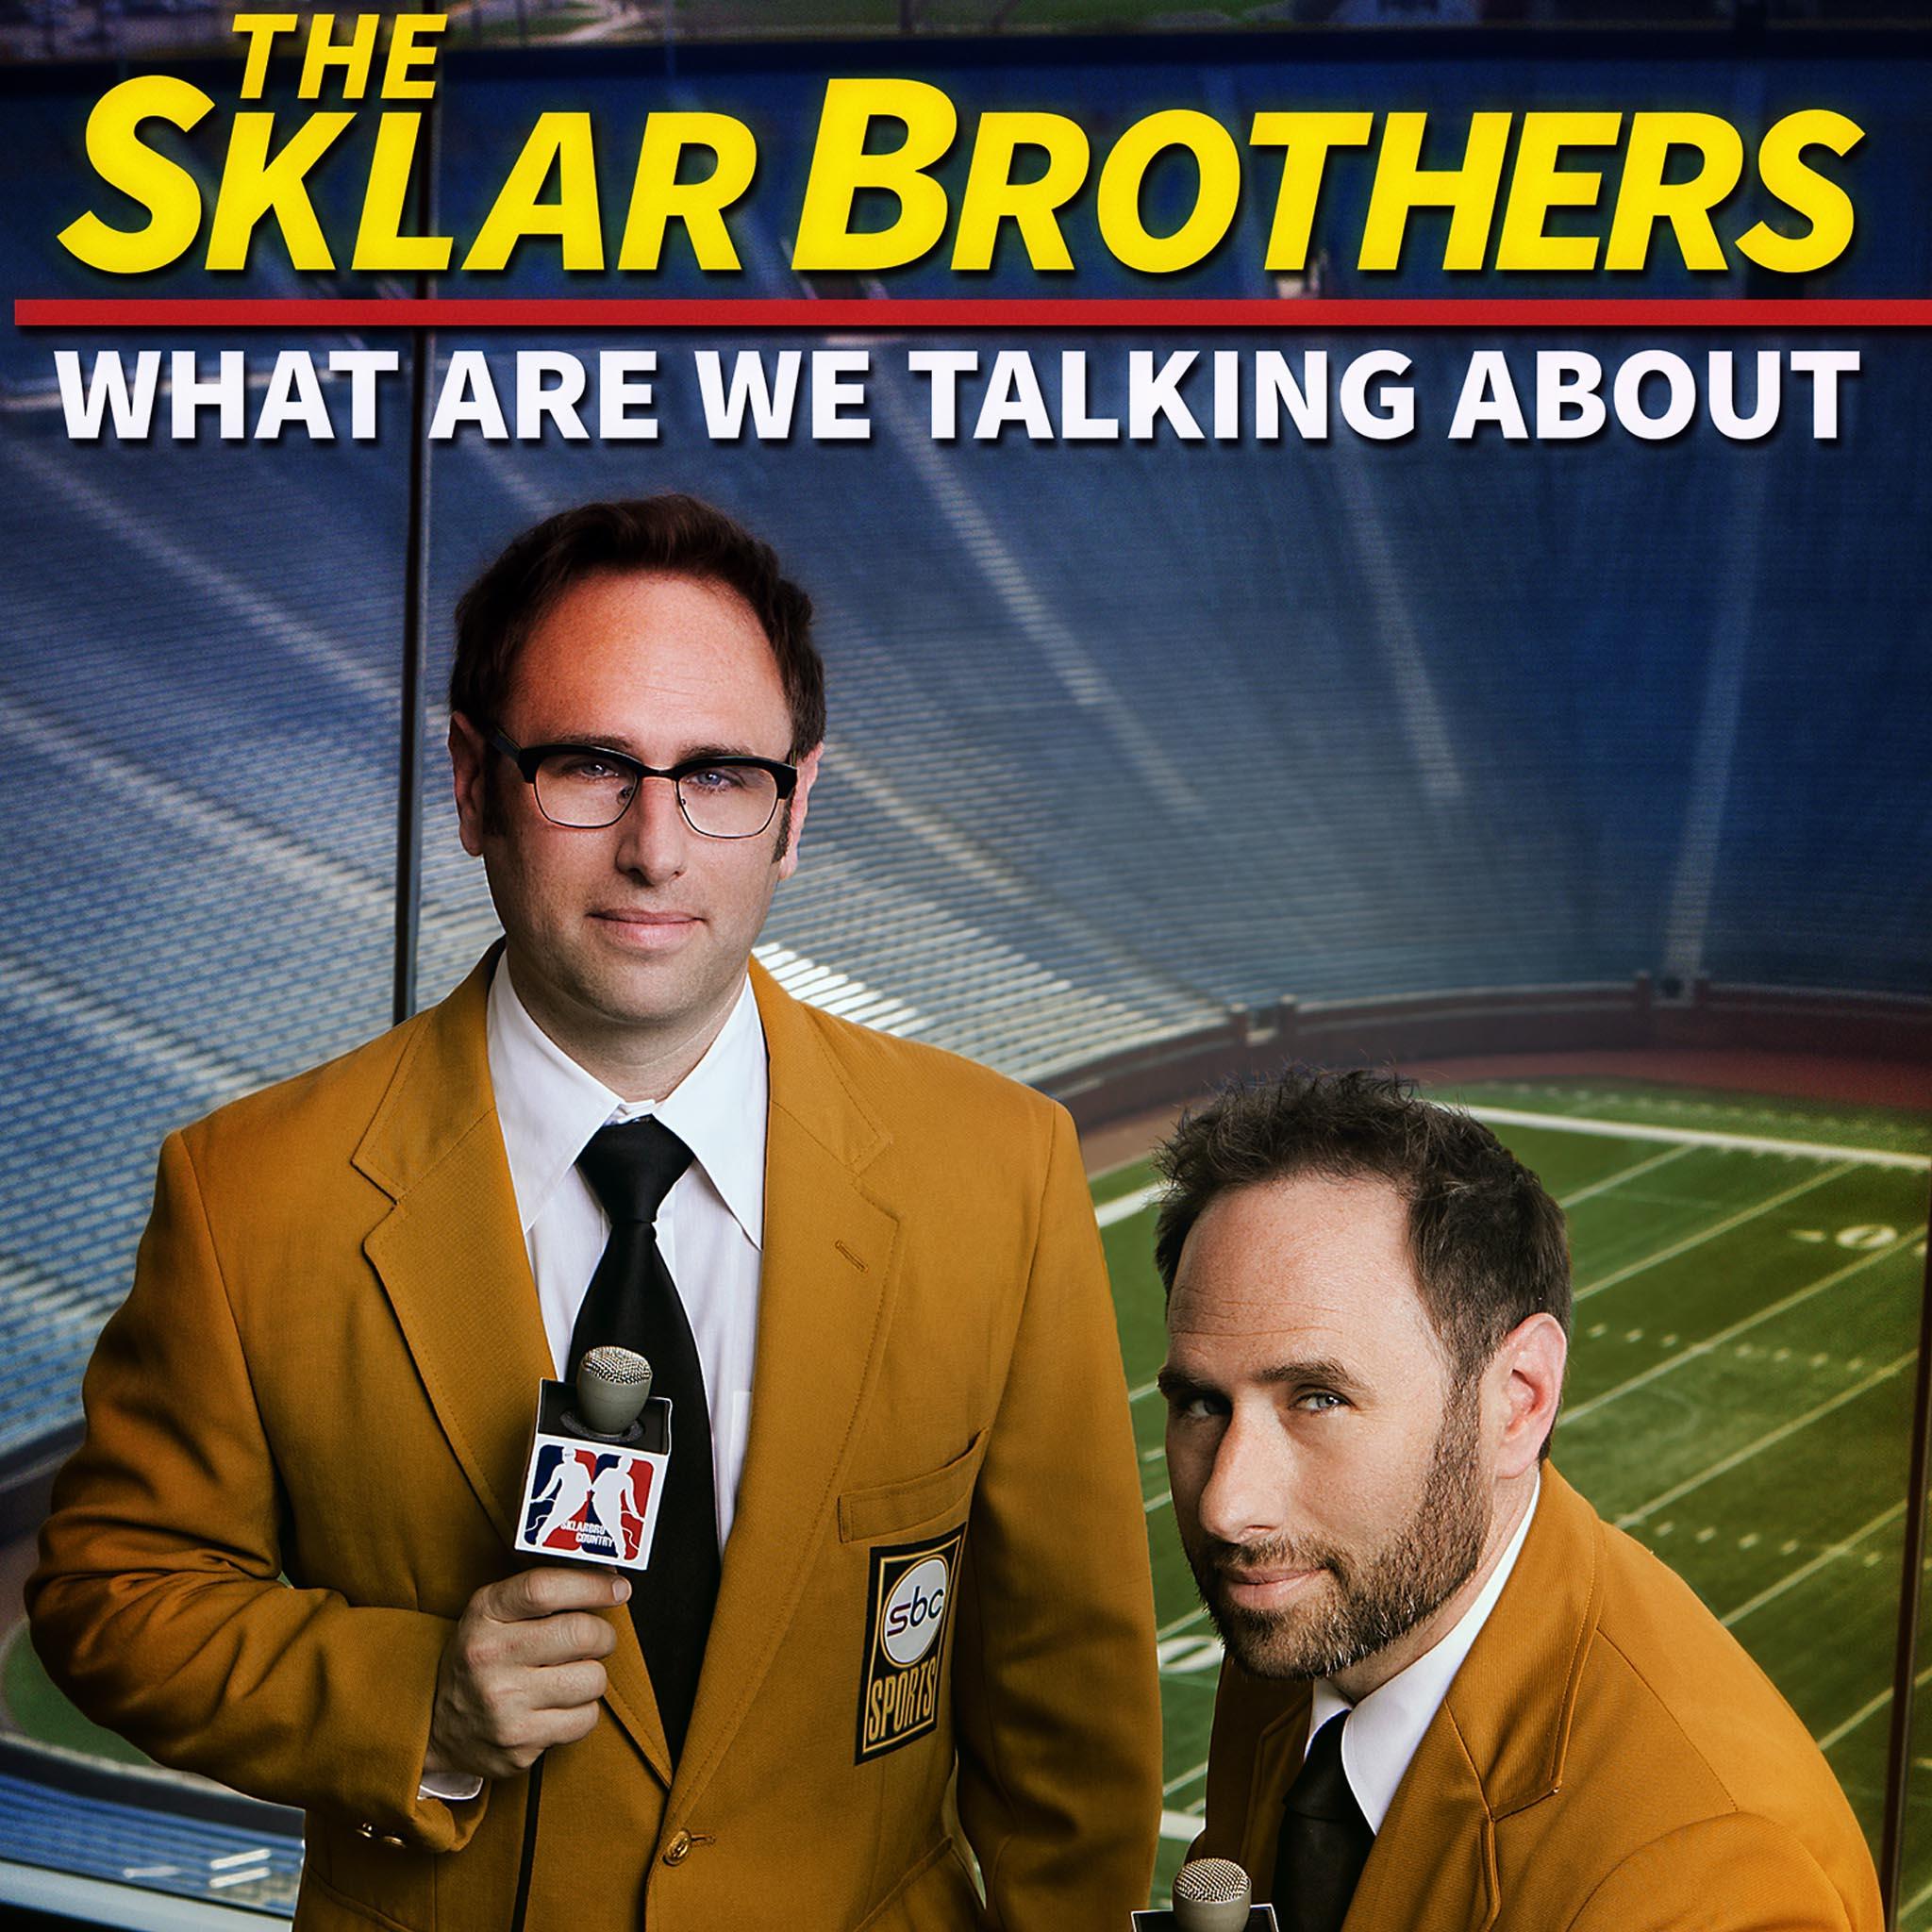 SklarBrothers WhatAreWeTalkingAbout x